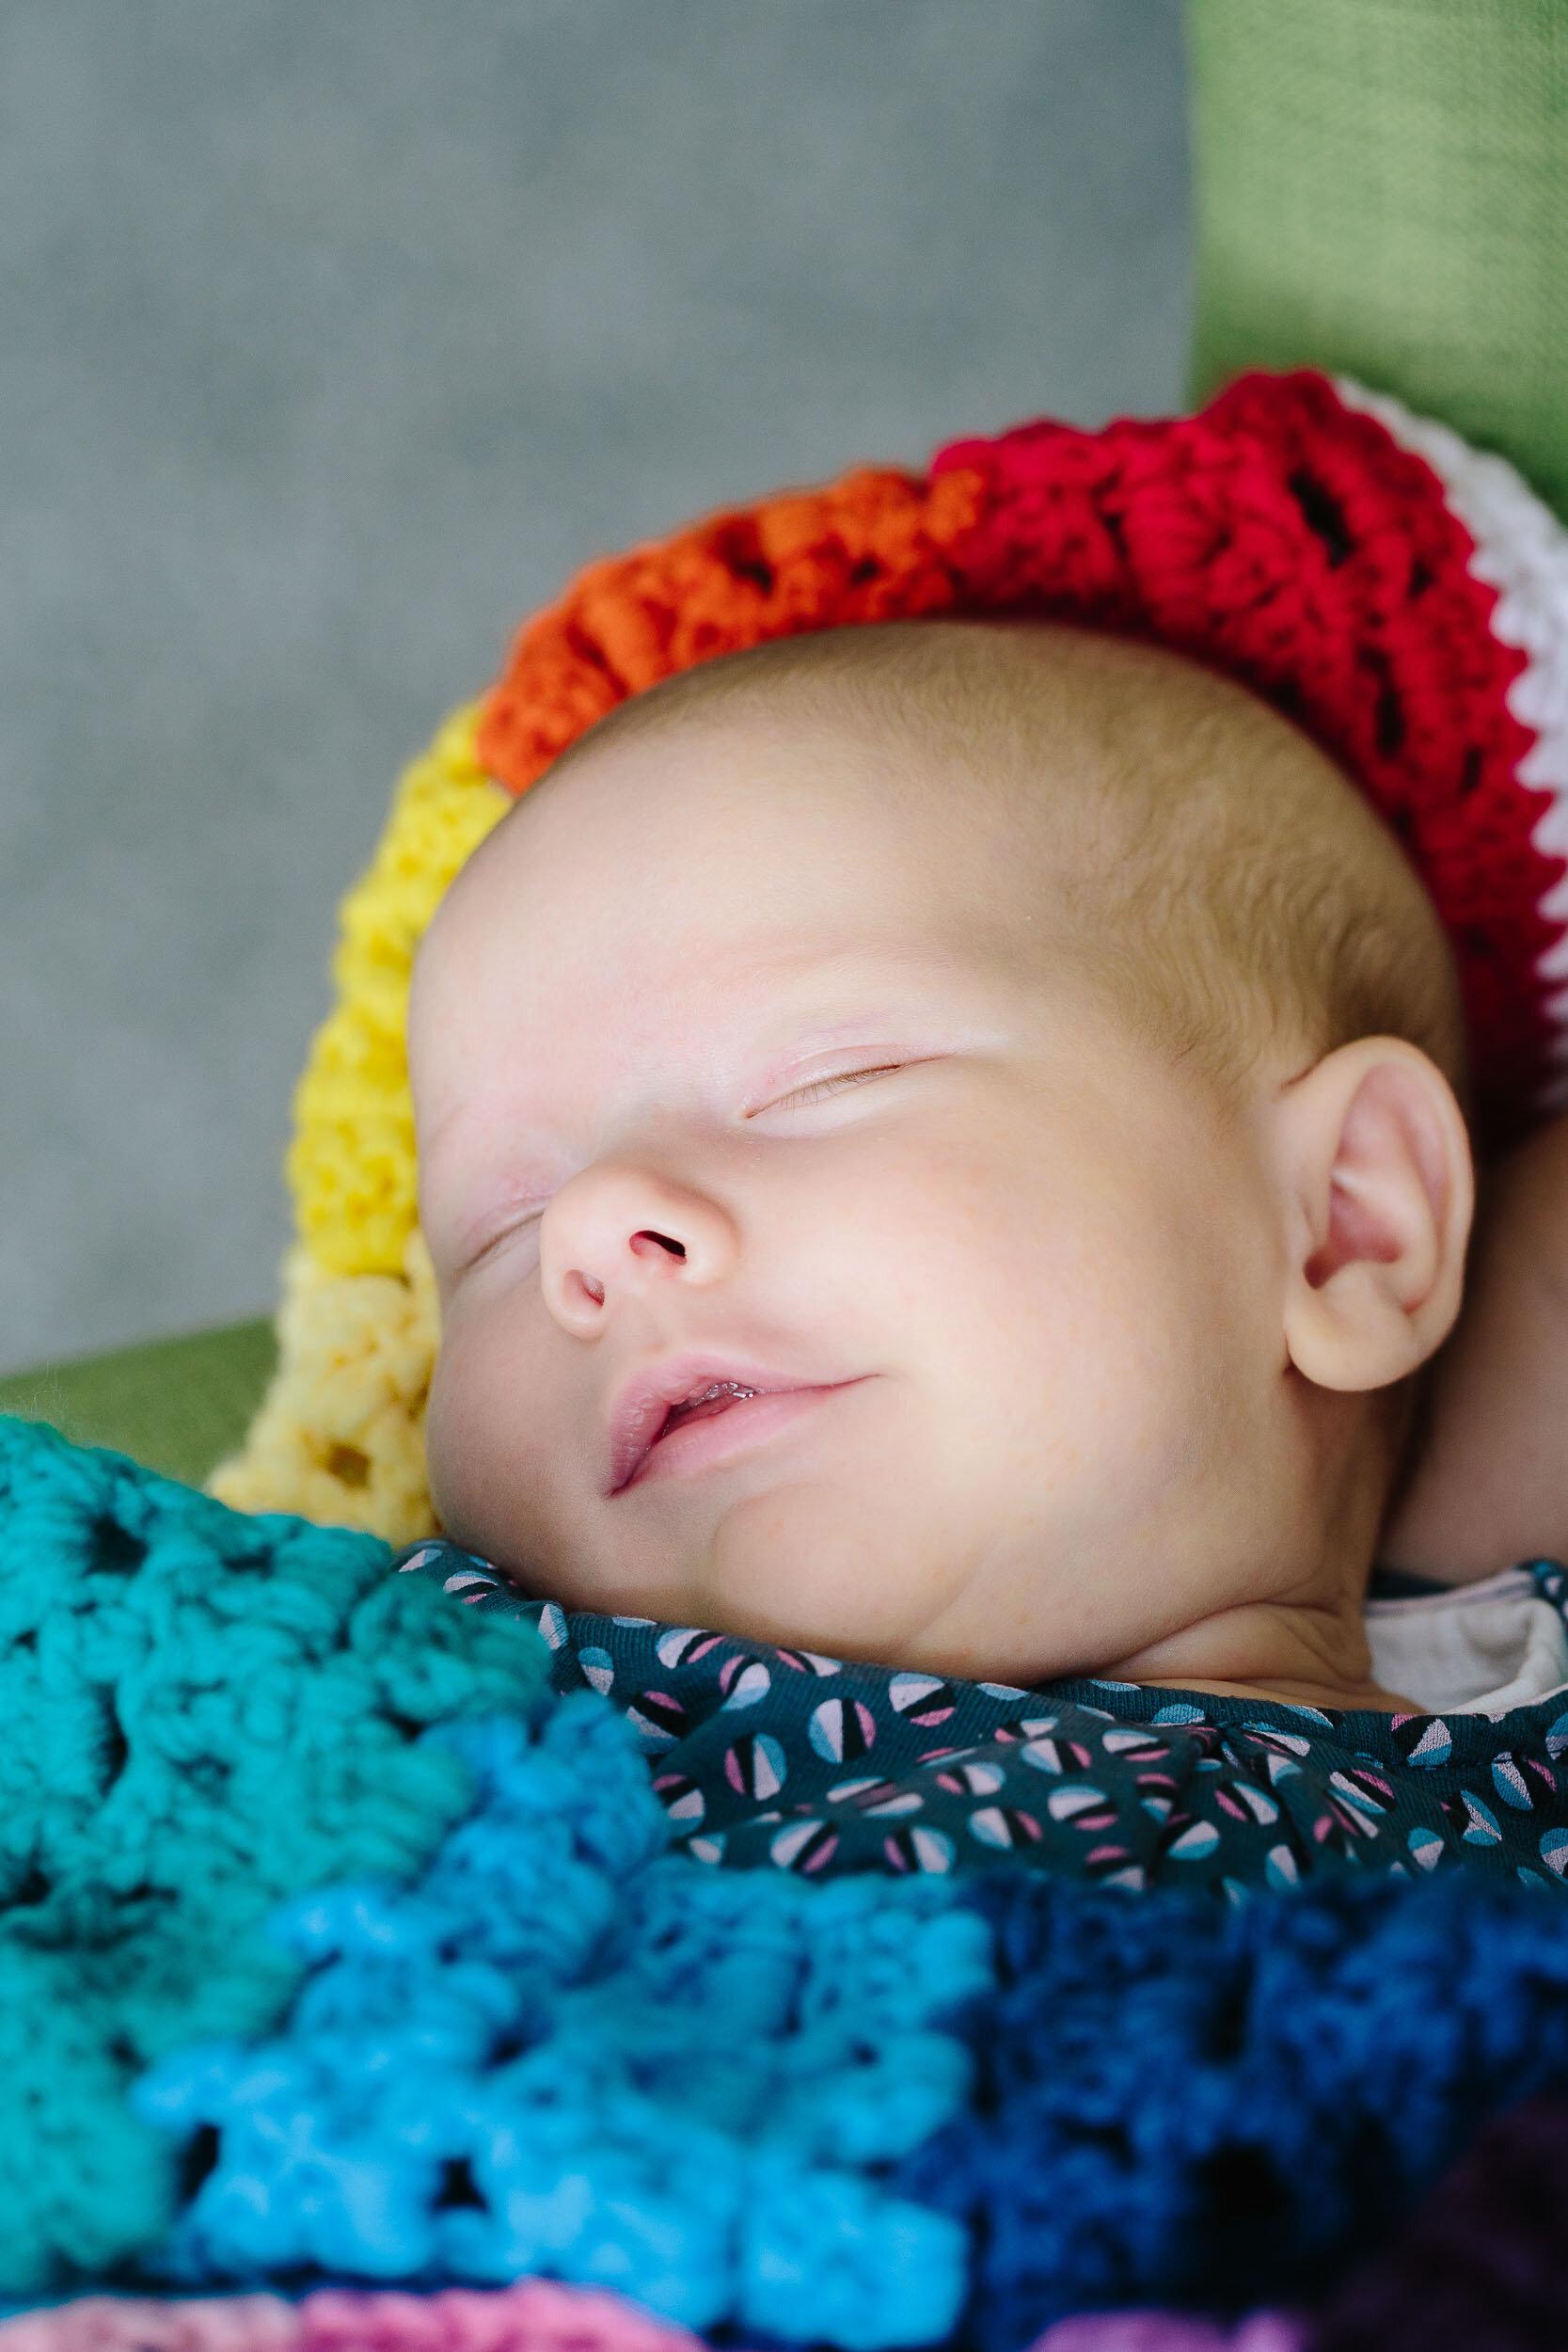 Baby lifestyle photo 09